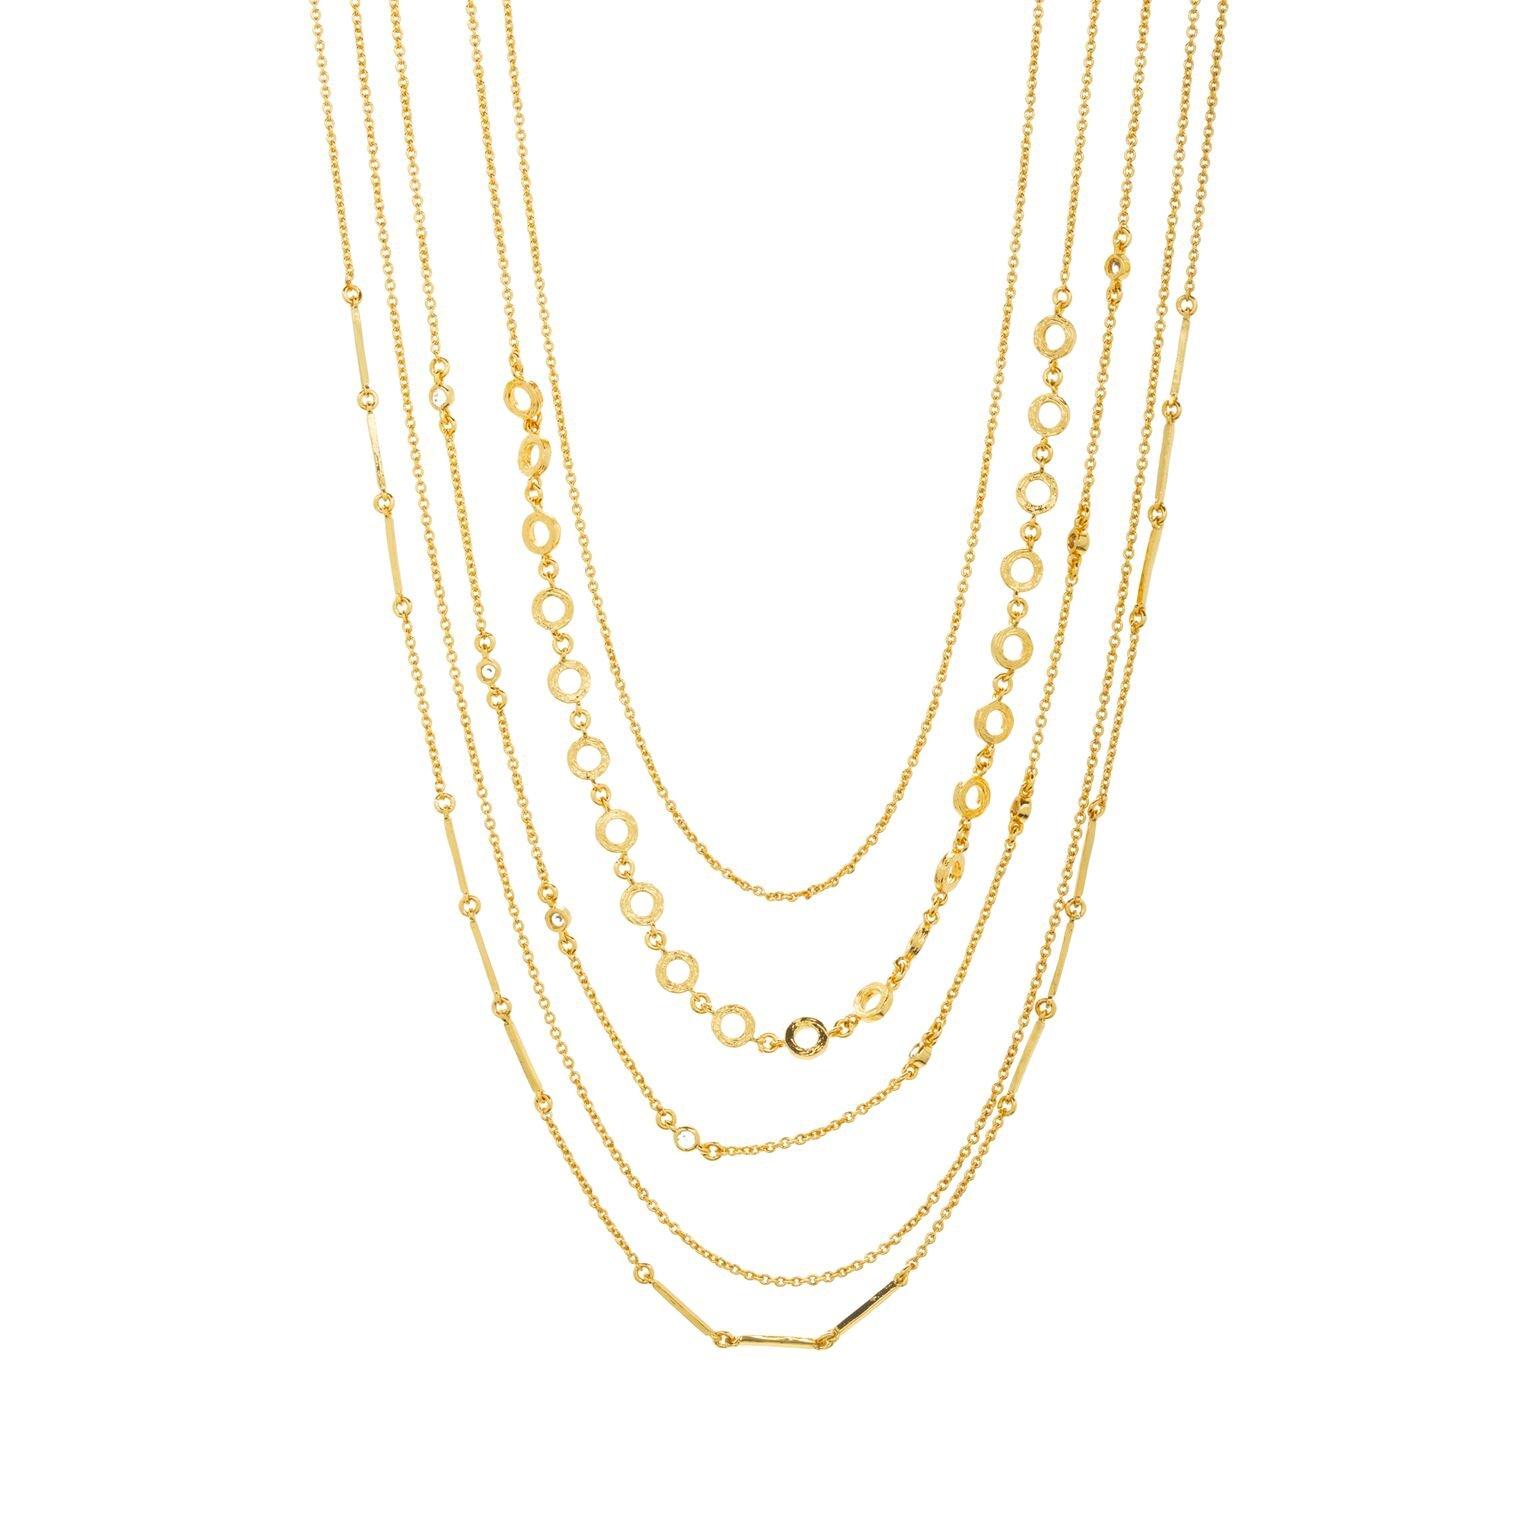 Gorjana Gold Shimmer Layered Necklace